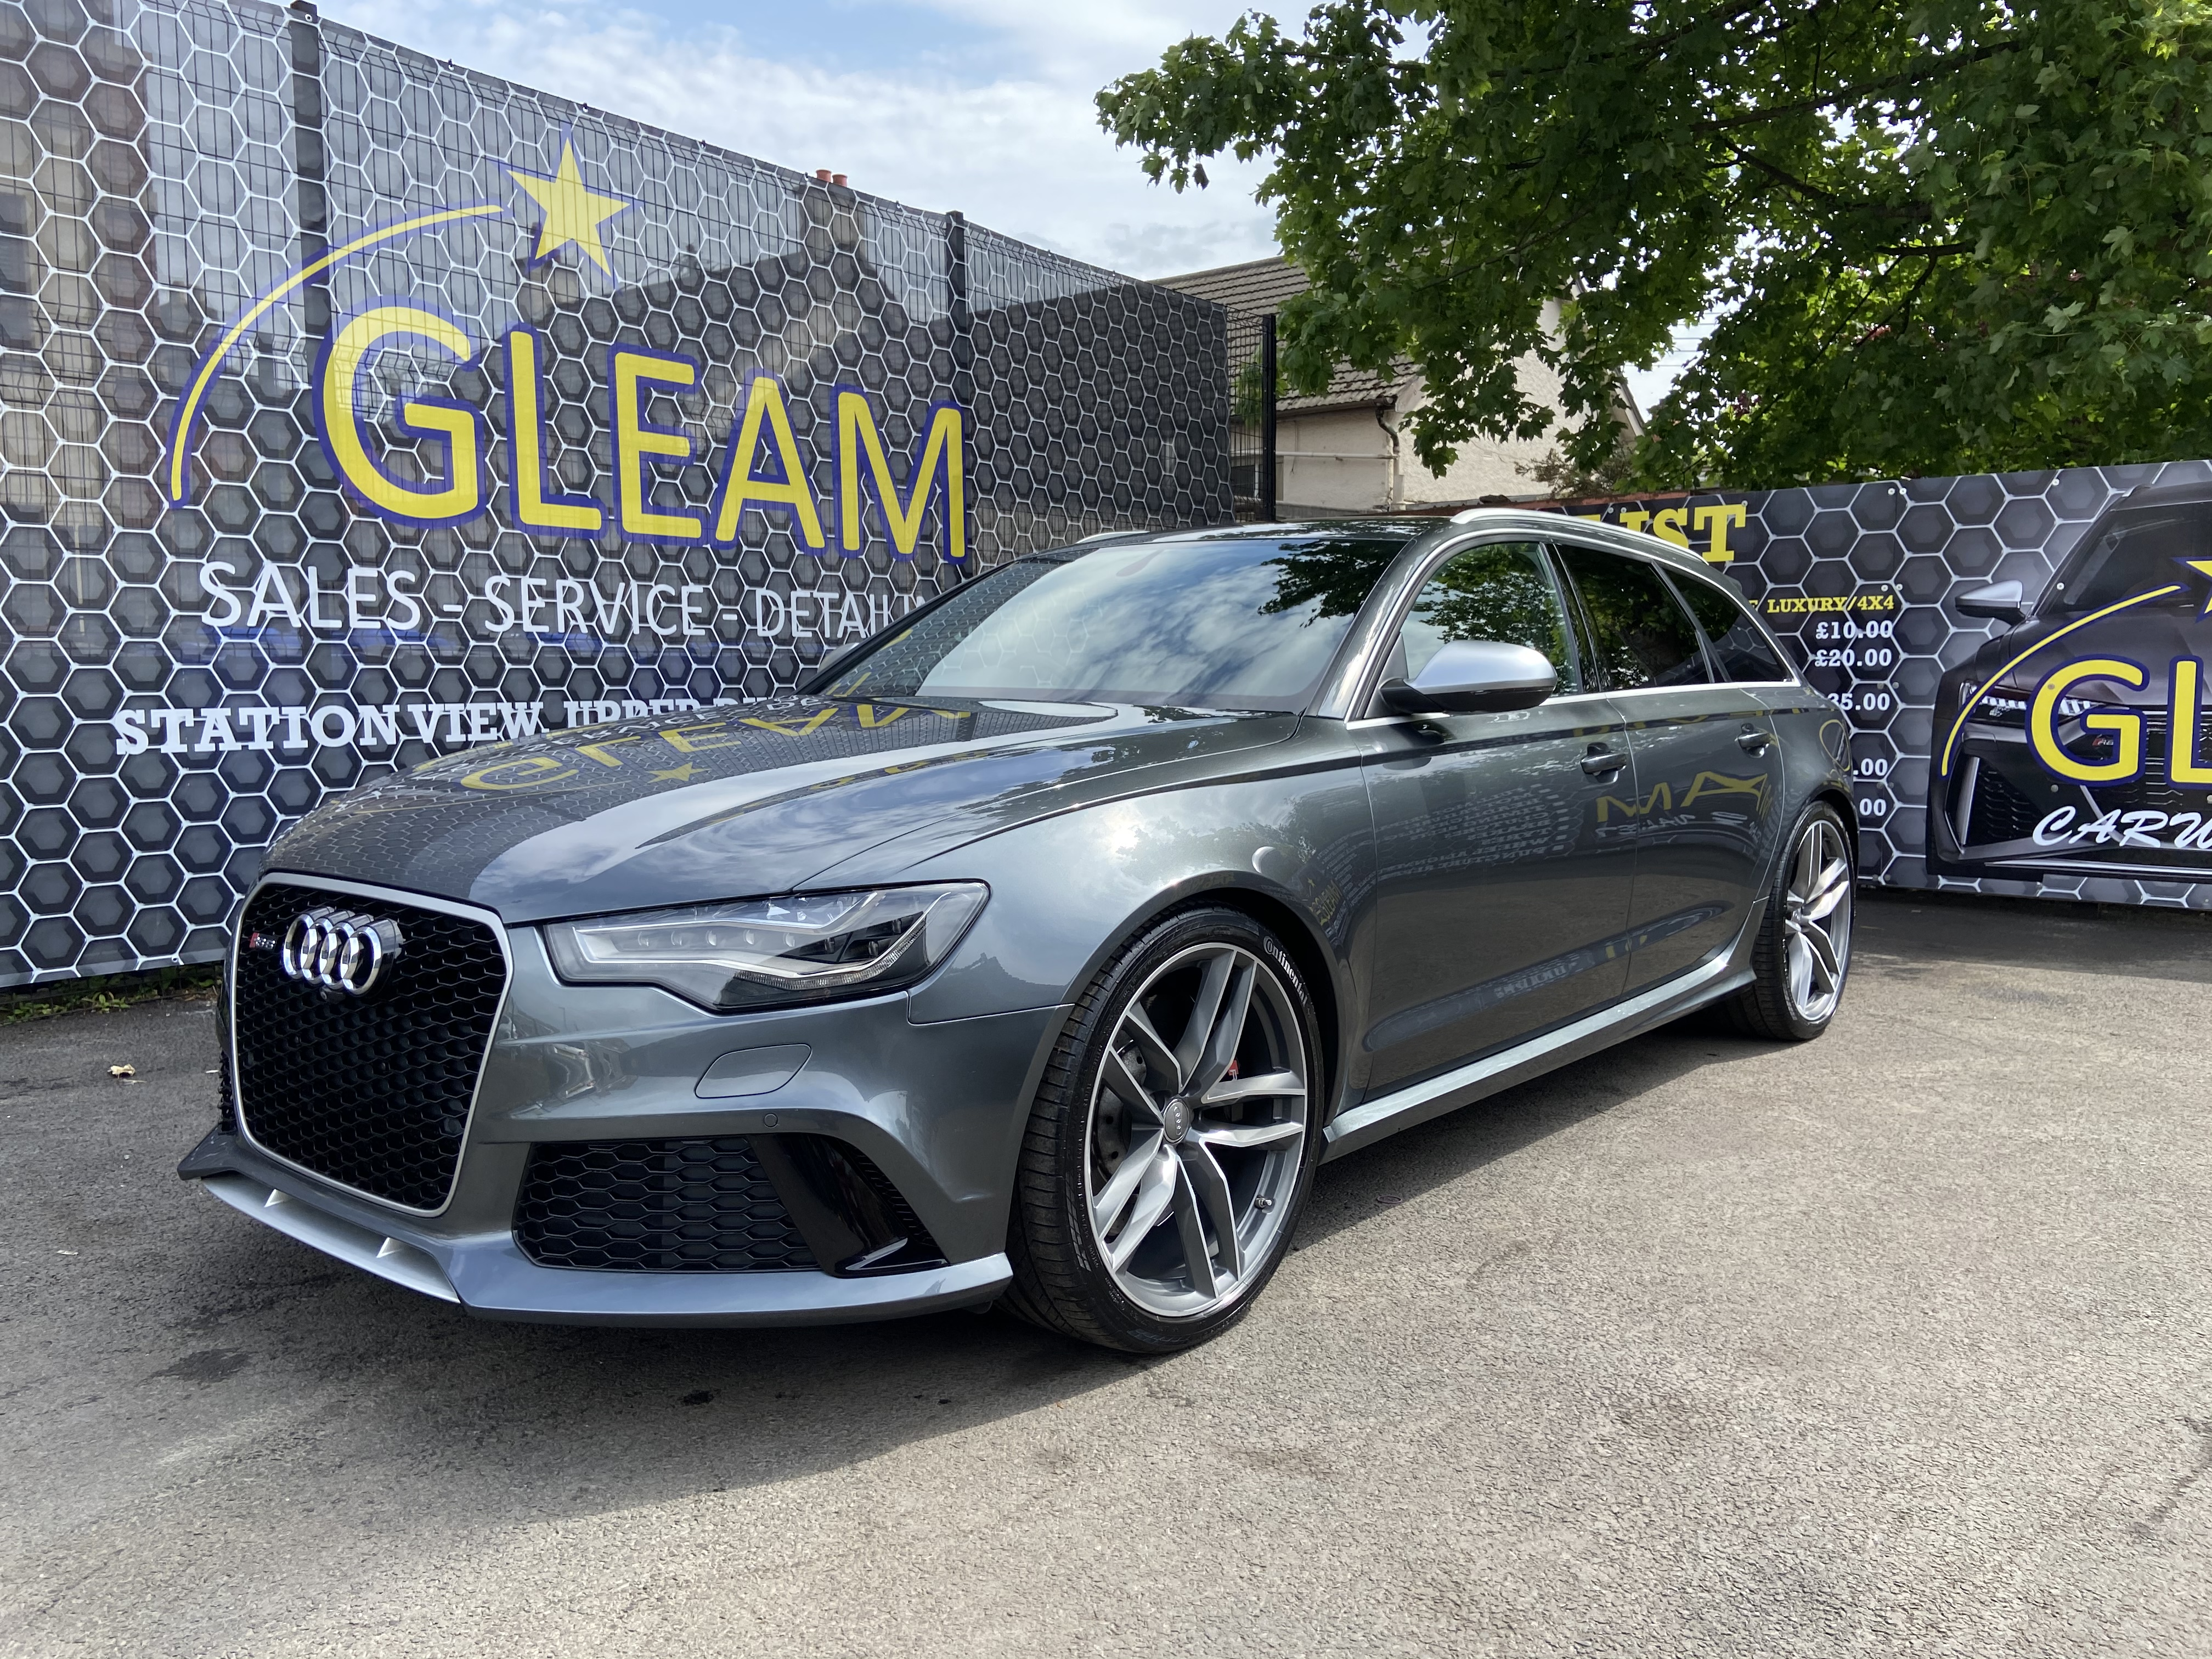 Gleam Auto Centre, Belfast